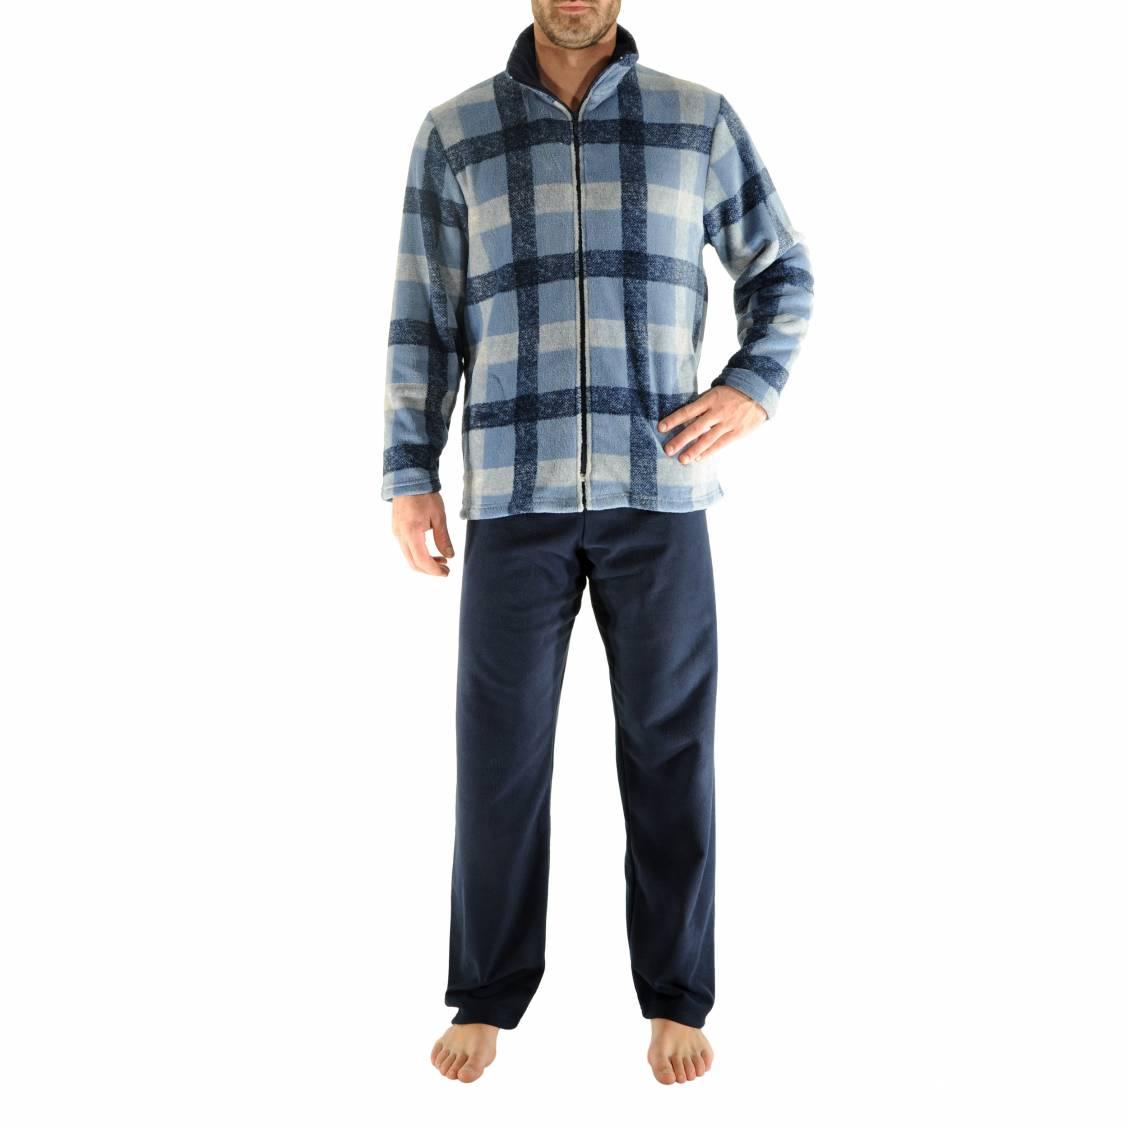 Pyjama chaud givry christian cane veste zipp e for Pyjama a carreaux